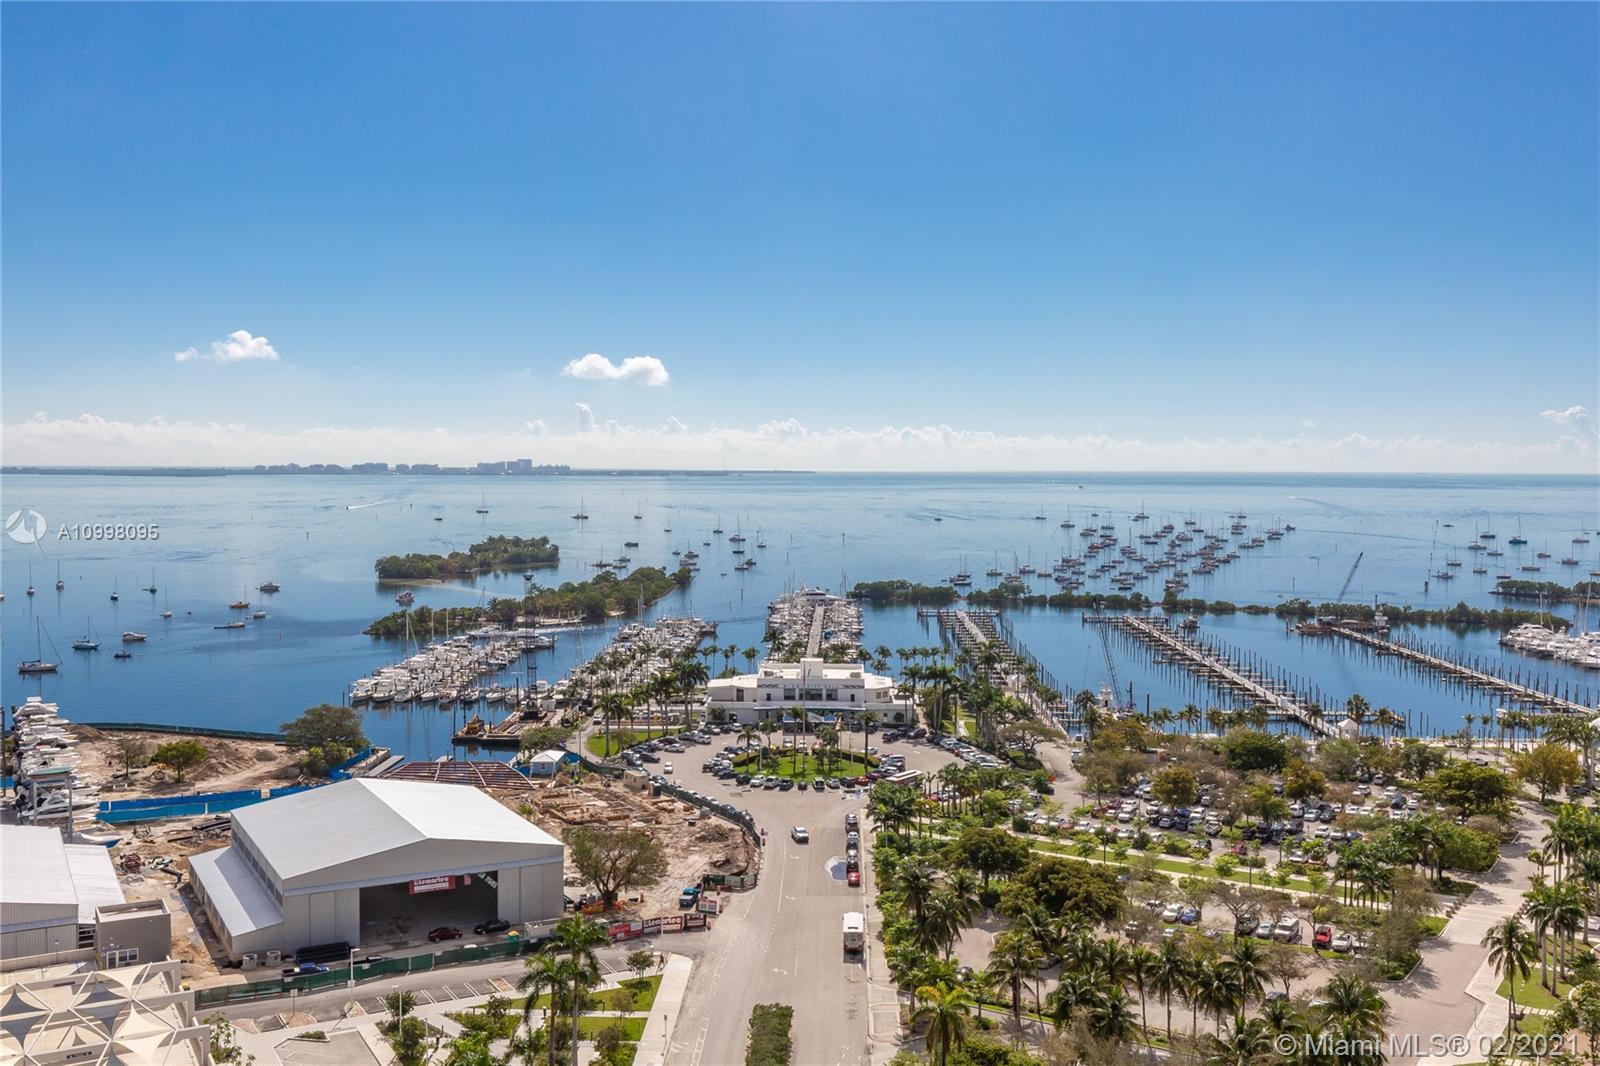 Grove At Grand Bay South Tower #1702S - 2675 S Bayshore Dr #1702S, Miami, FL 33133